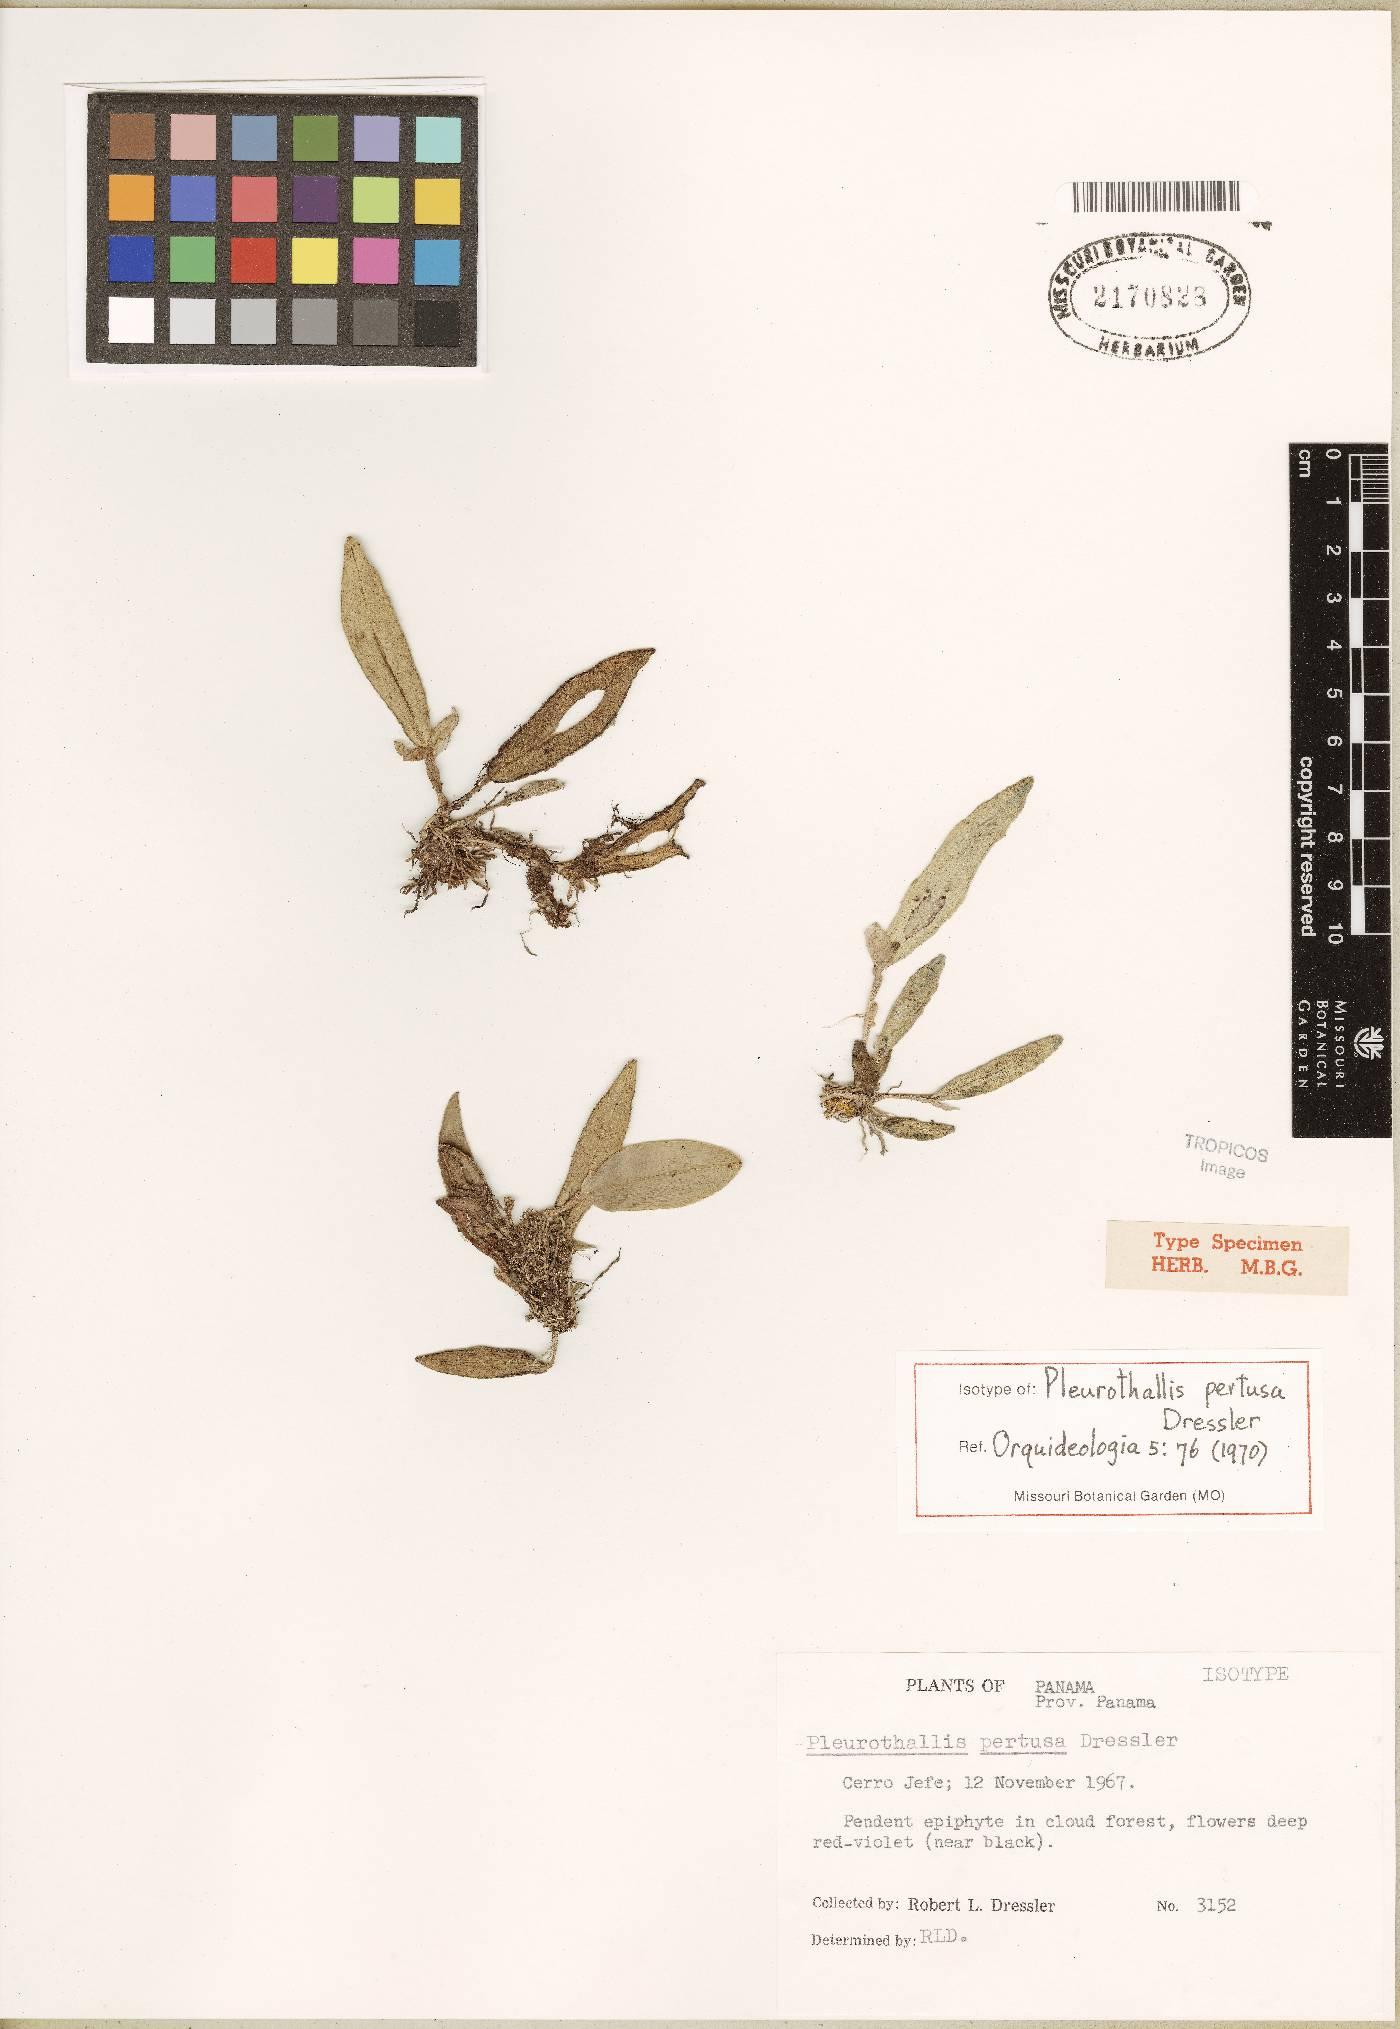 Dresslerella pertusa image